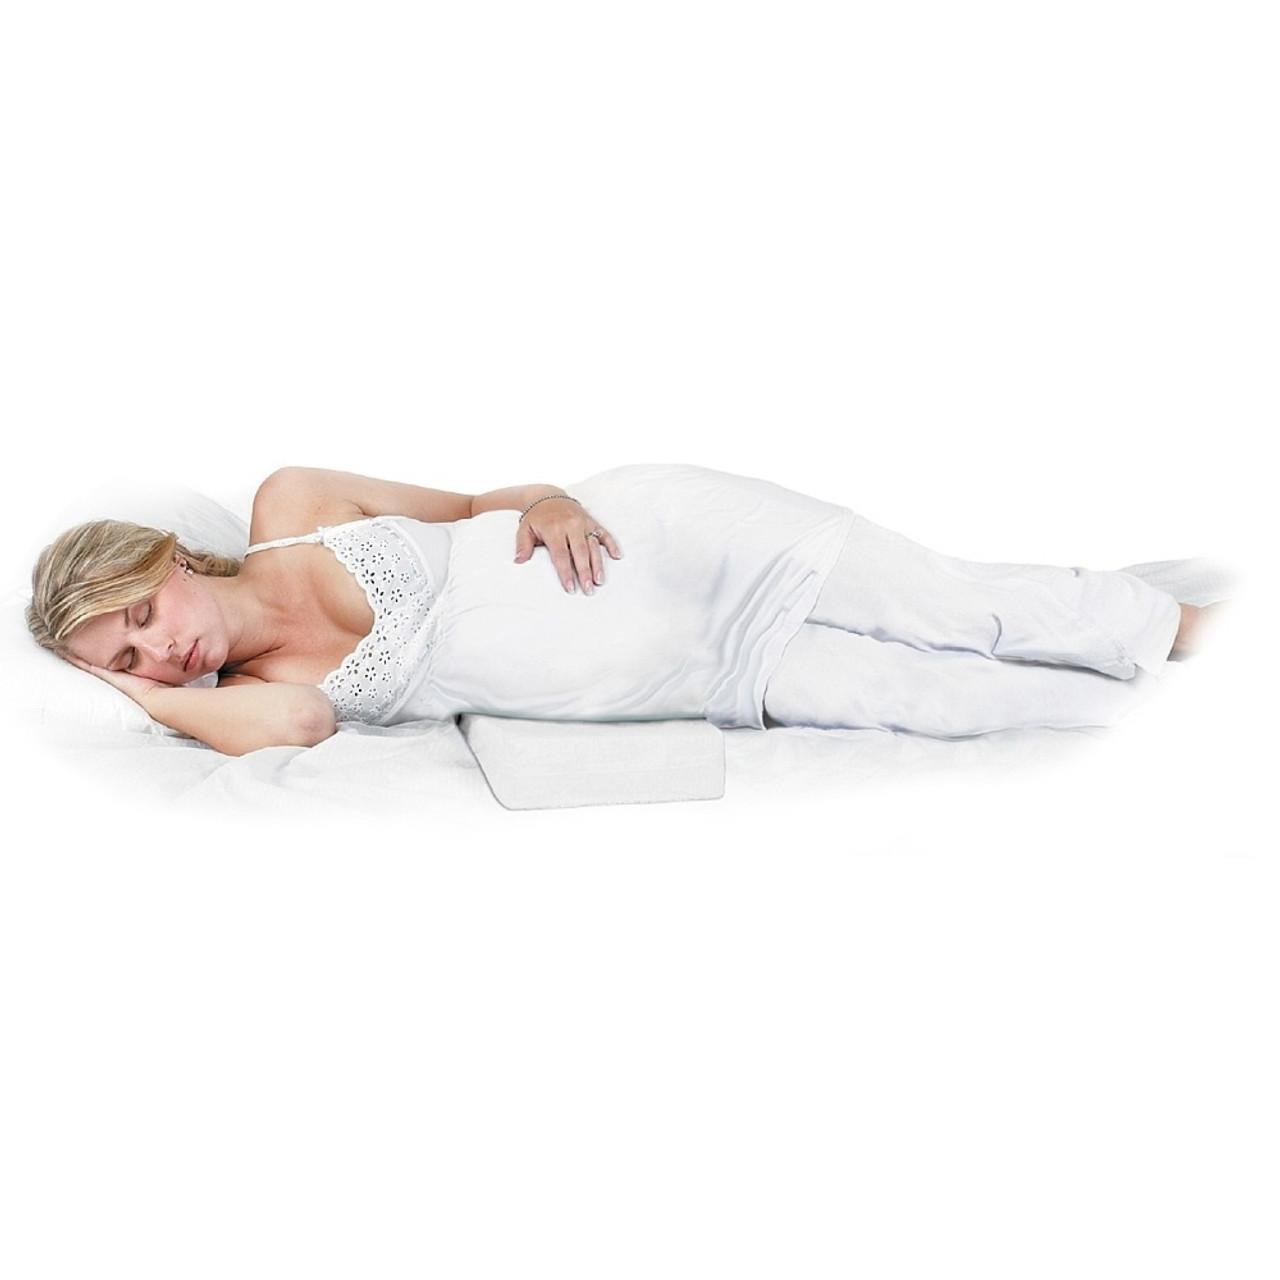 Jolly Jumper Pregnancy Wedge / Pillow